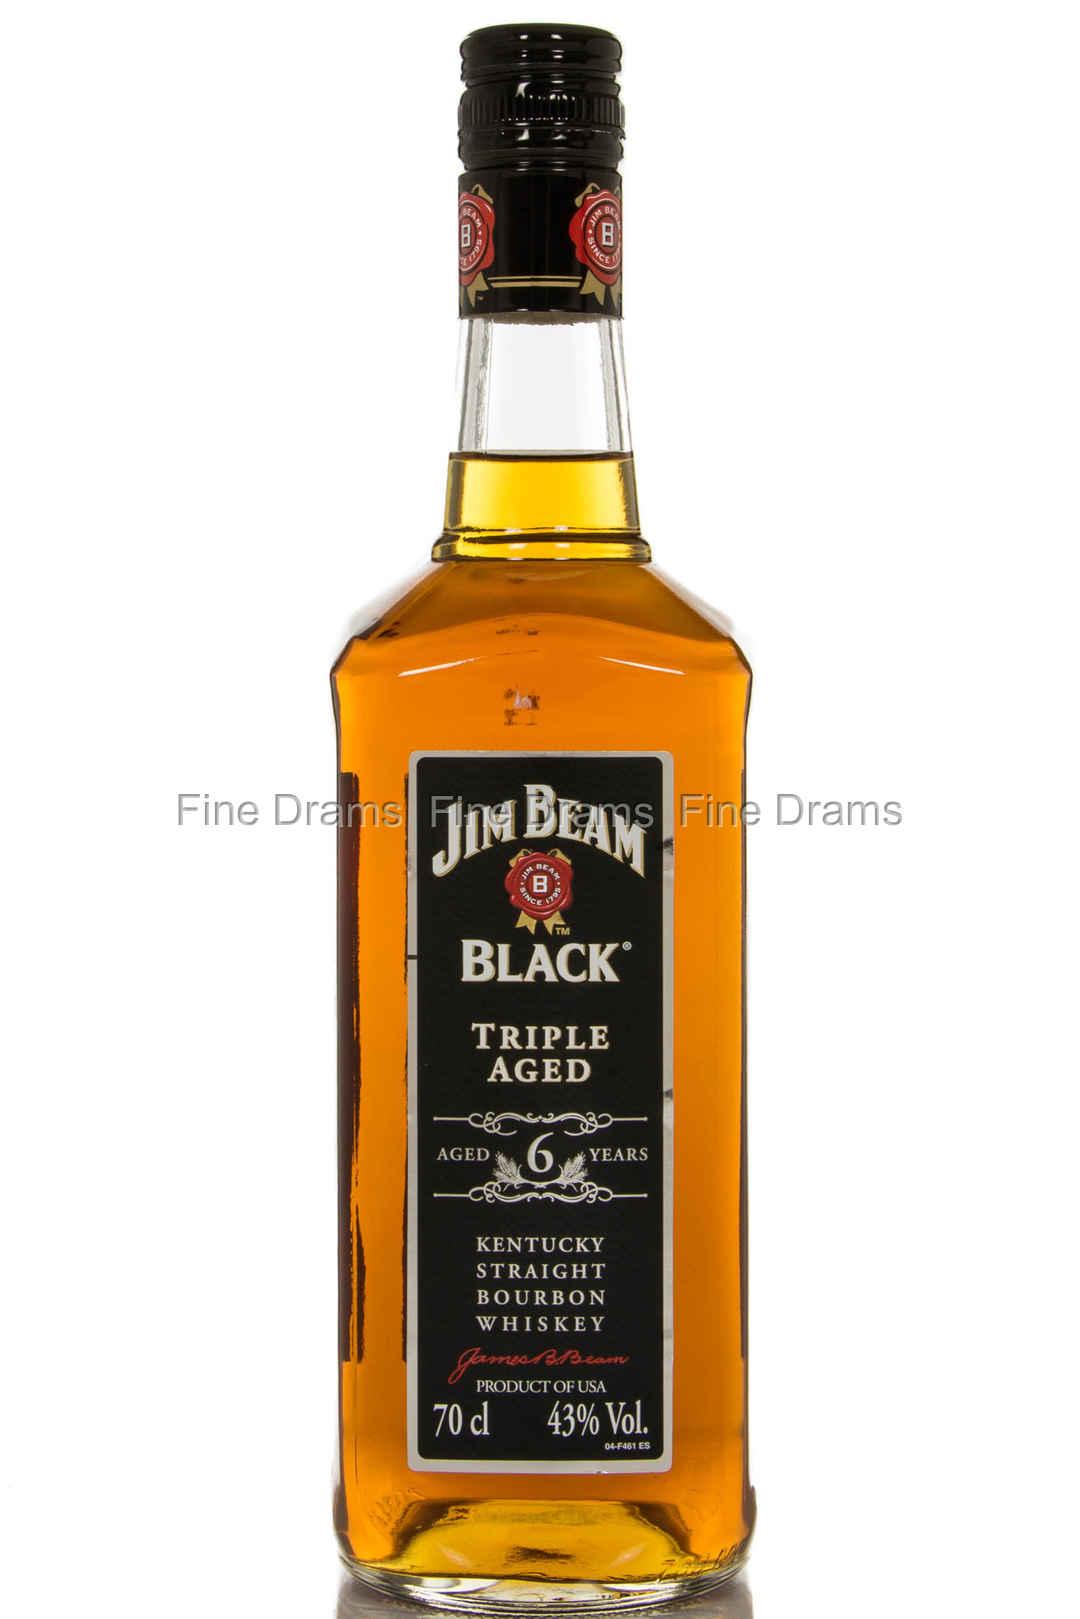 Jim Beam Black 6 Year Old Bourbon Whiskey